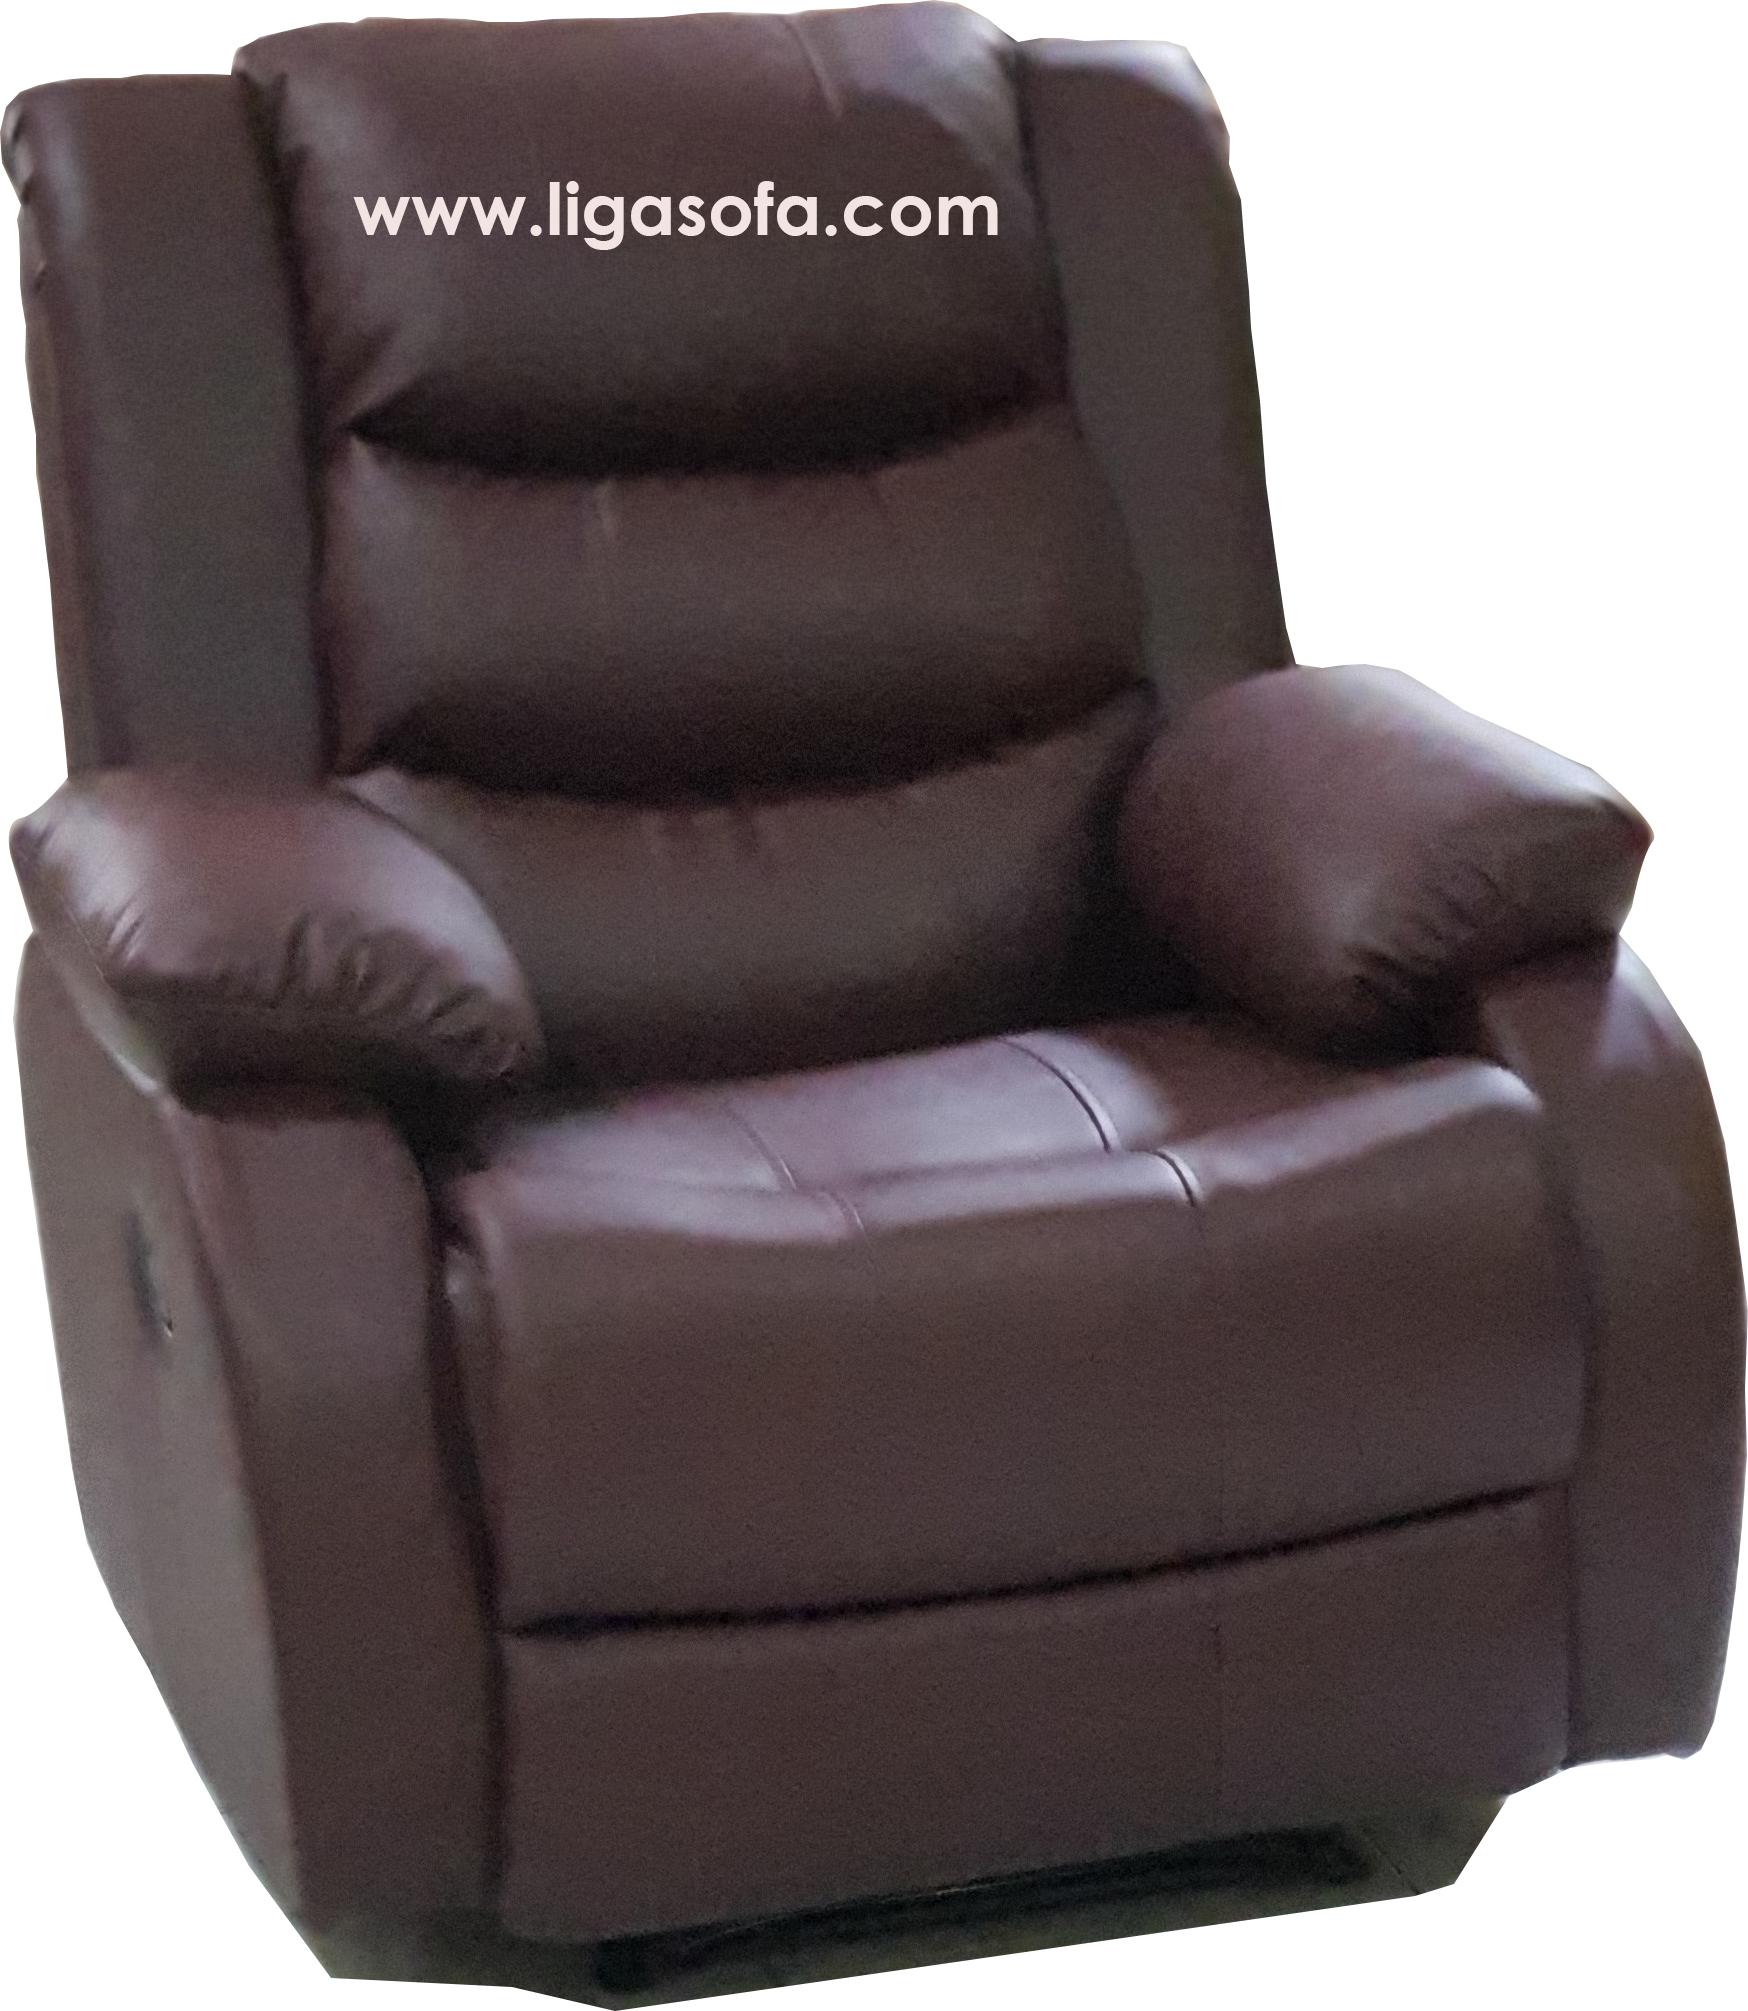 Surprising Jual Sofa Dan Service Sofa Jakarta Dgn Harga Sofa Murah Unemploymentrelief Wooden Chair Designs For Living Room Unemploymentrelieforg